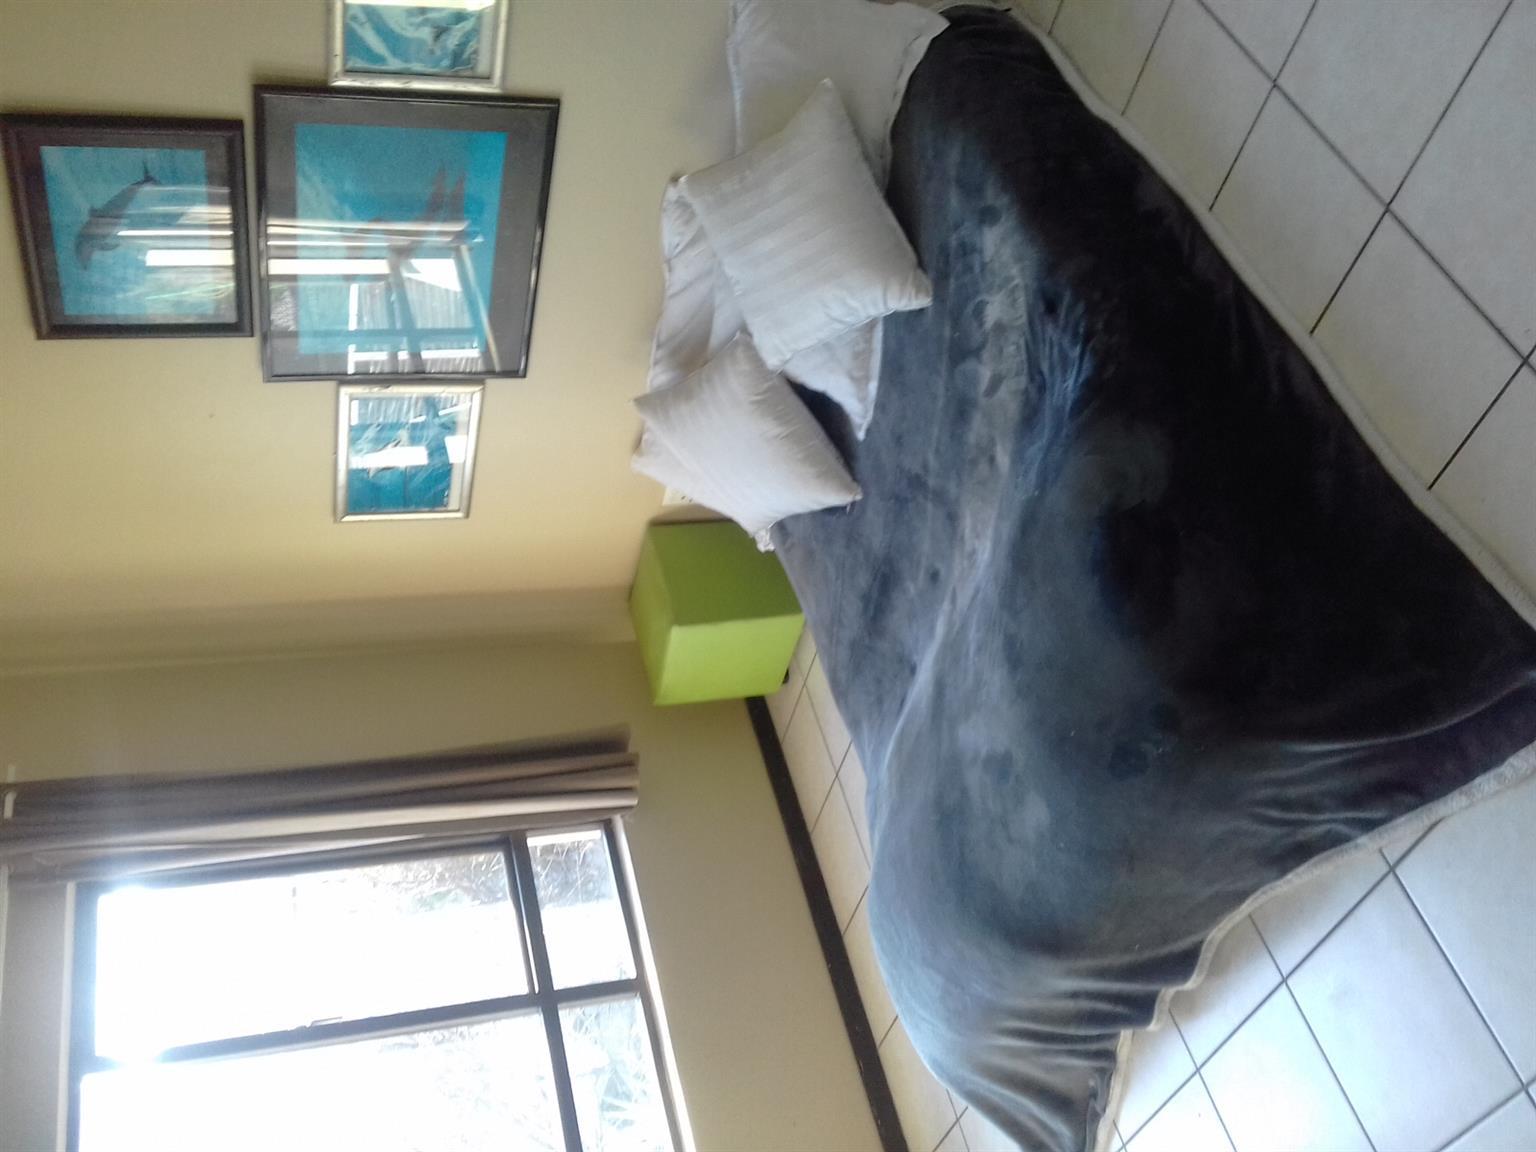 LONEHILL LUXURY LOFTS - 1 Bed loft.